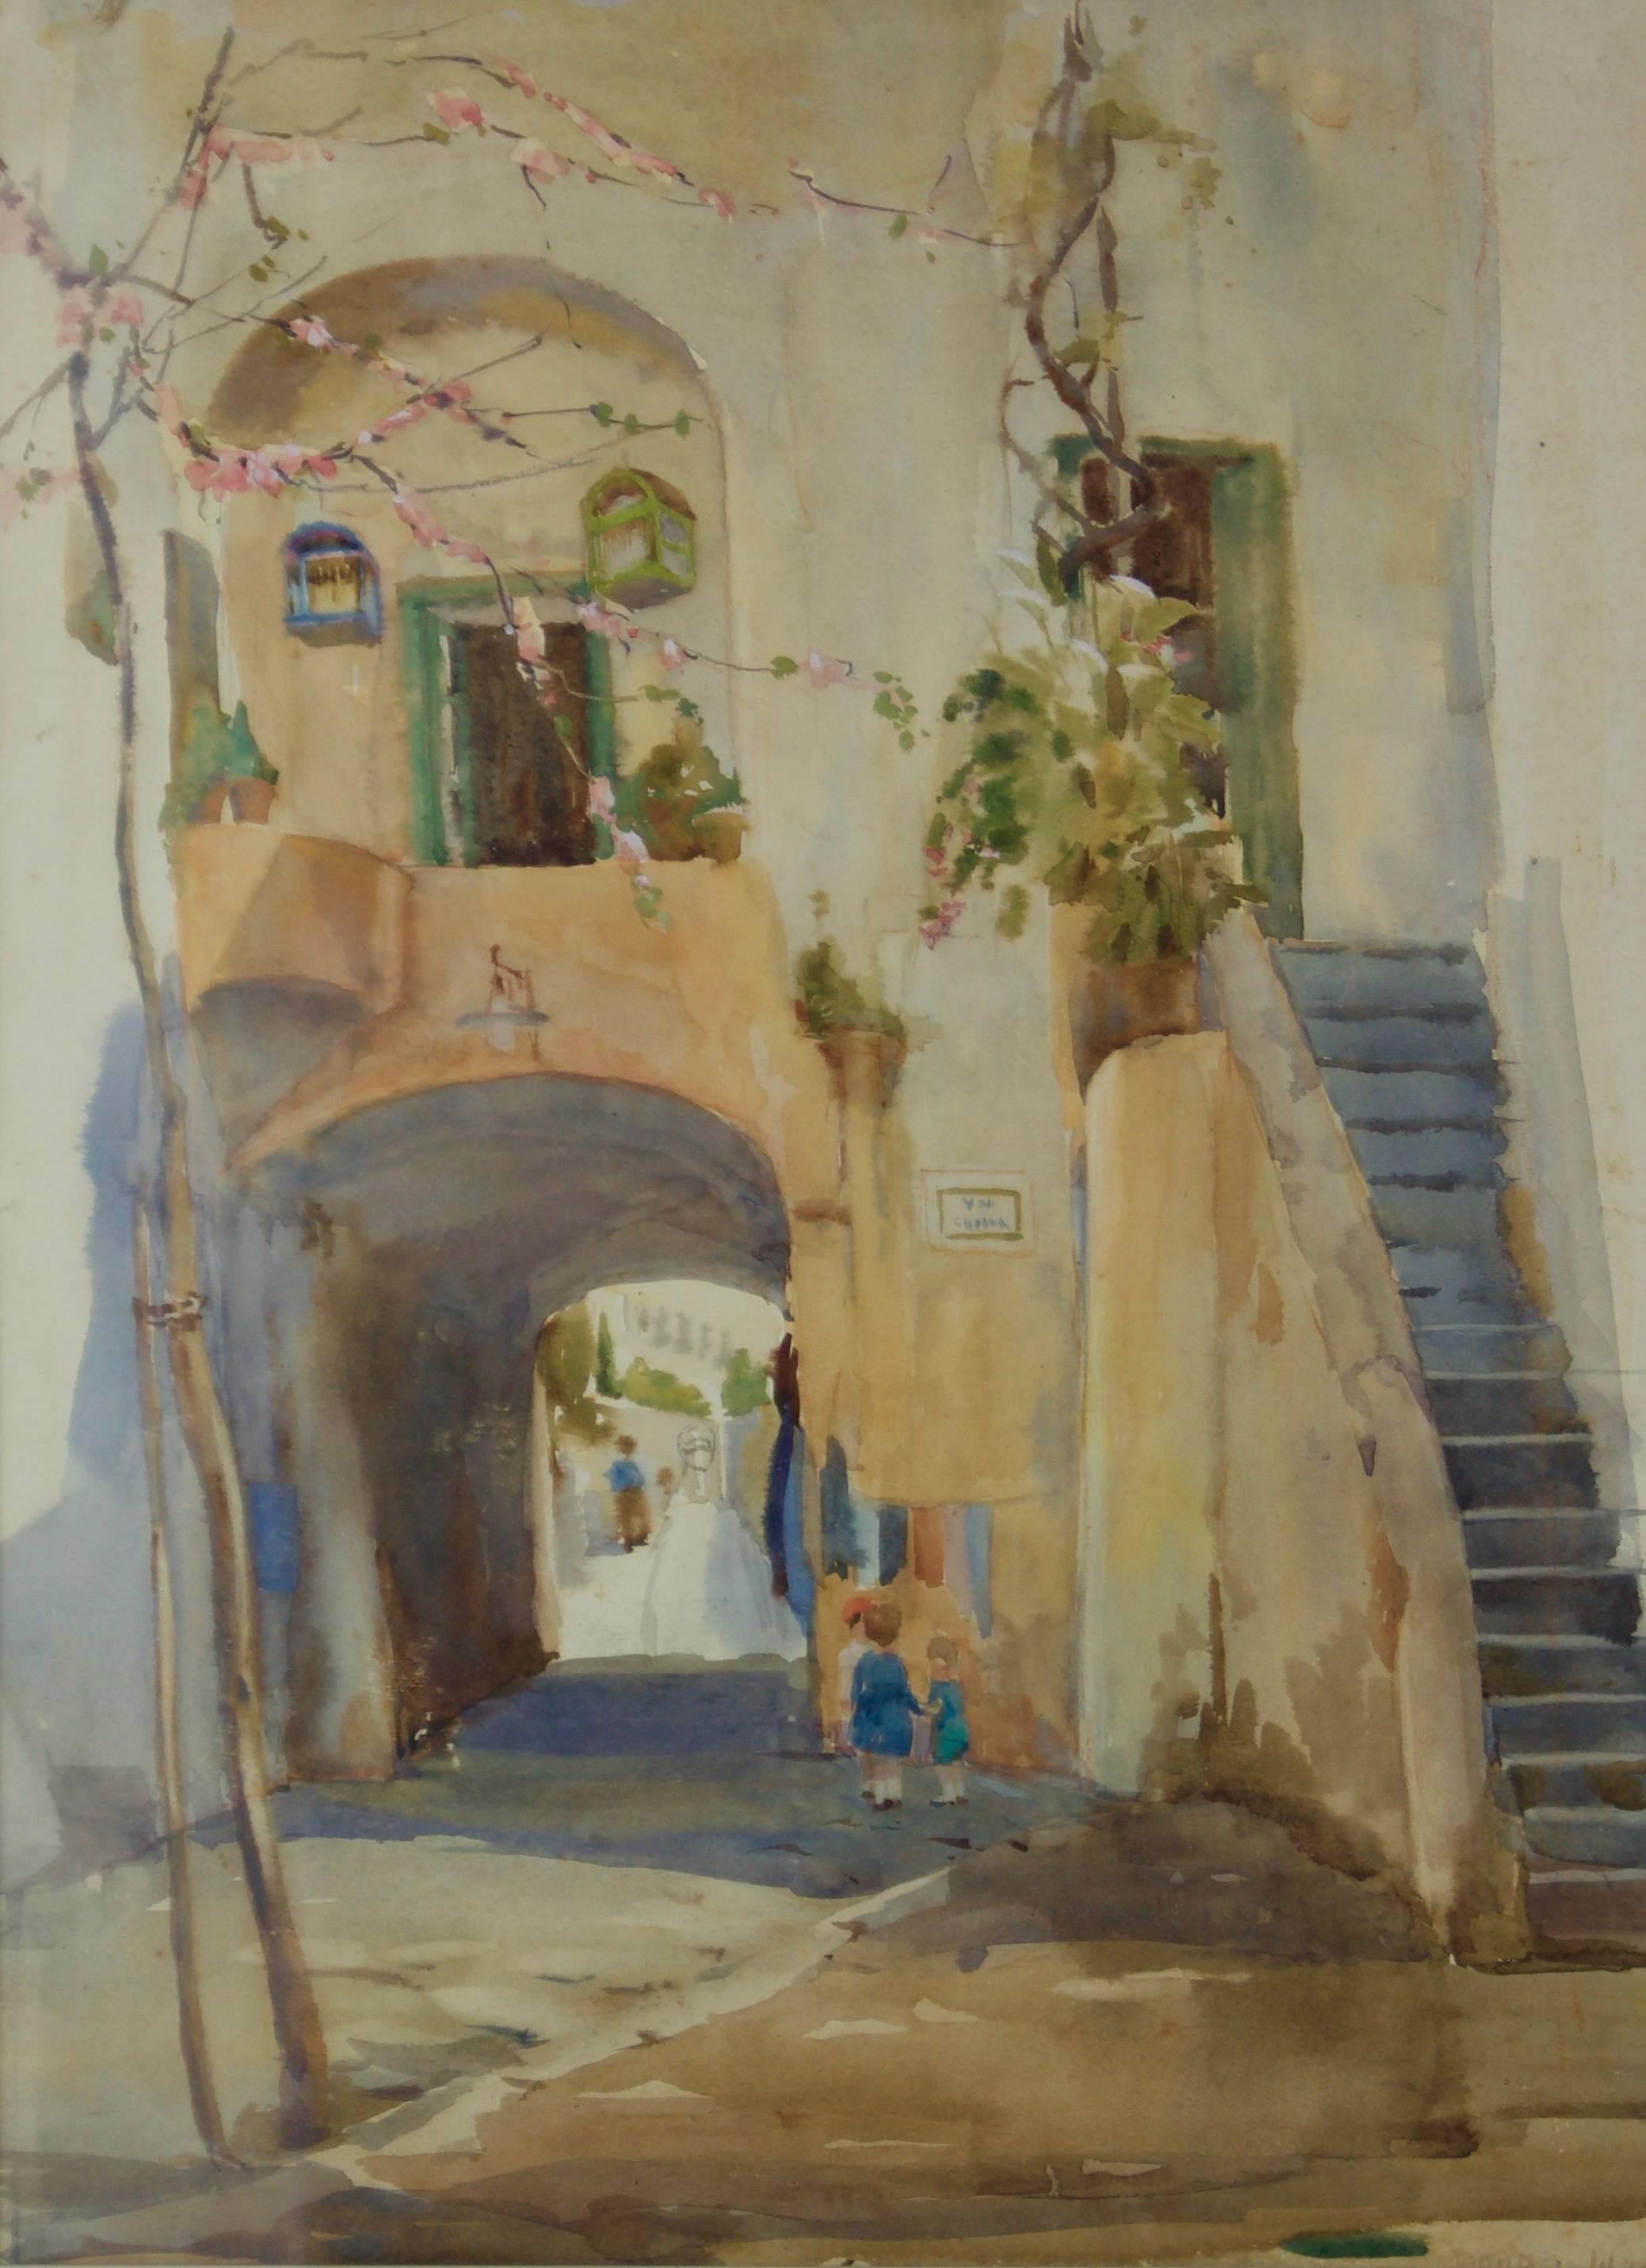 Italian Village - Mid 20th Century Impressionist Watercolour by Bennett